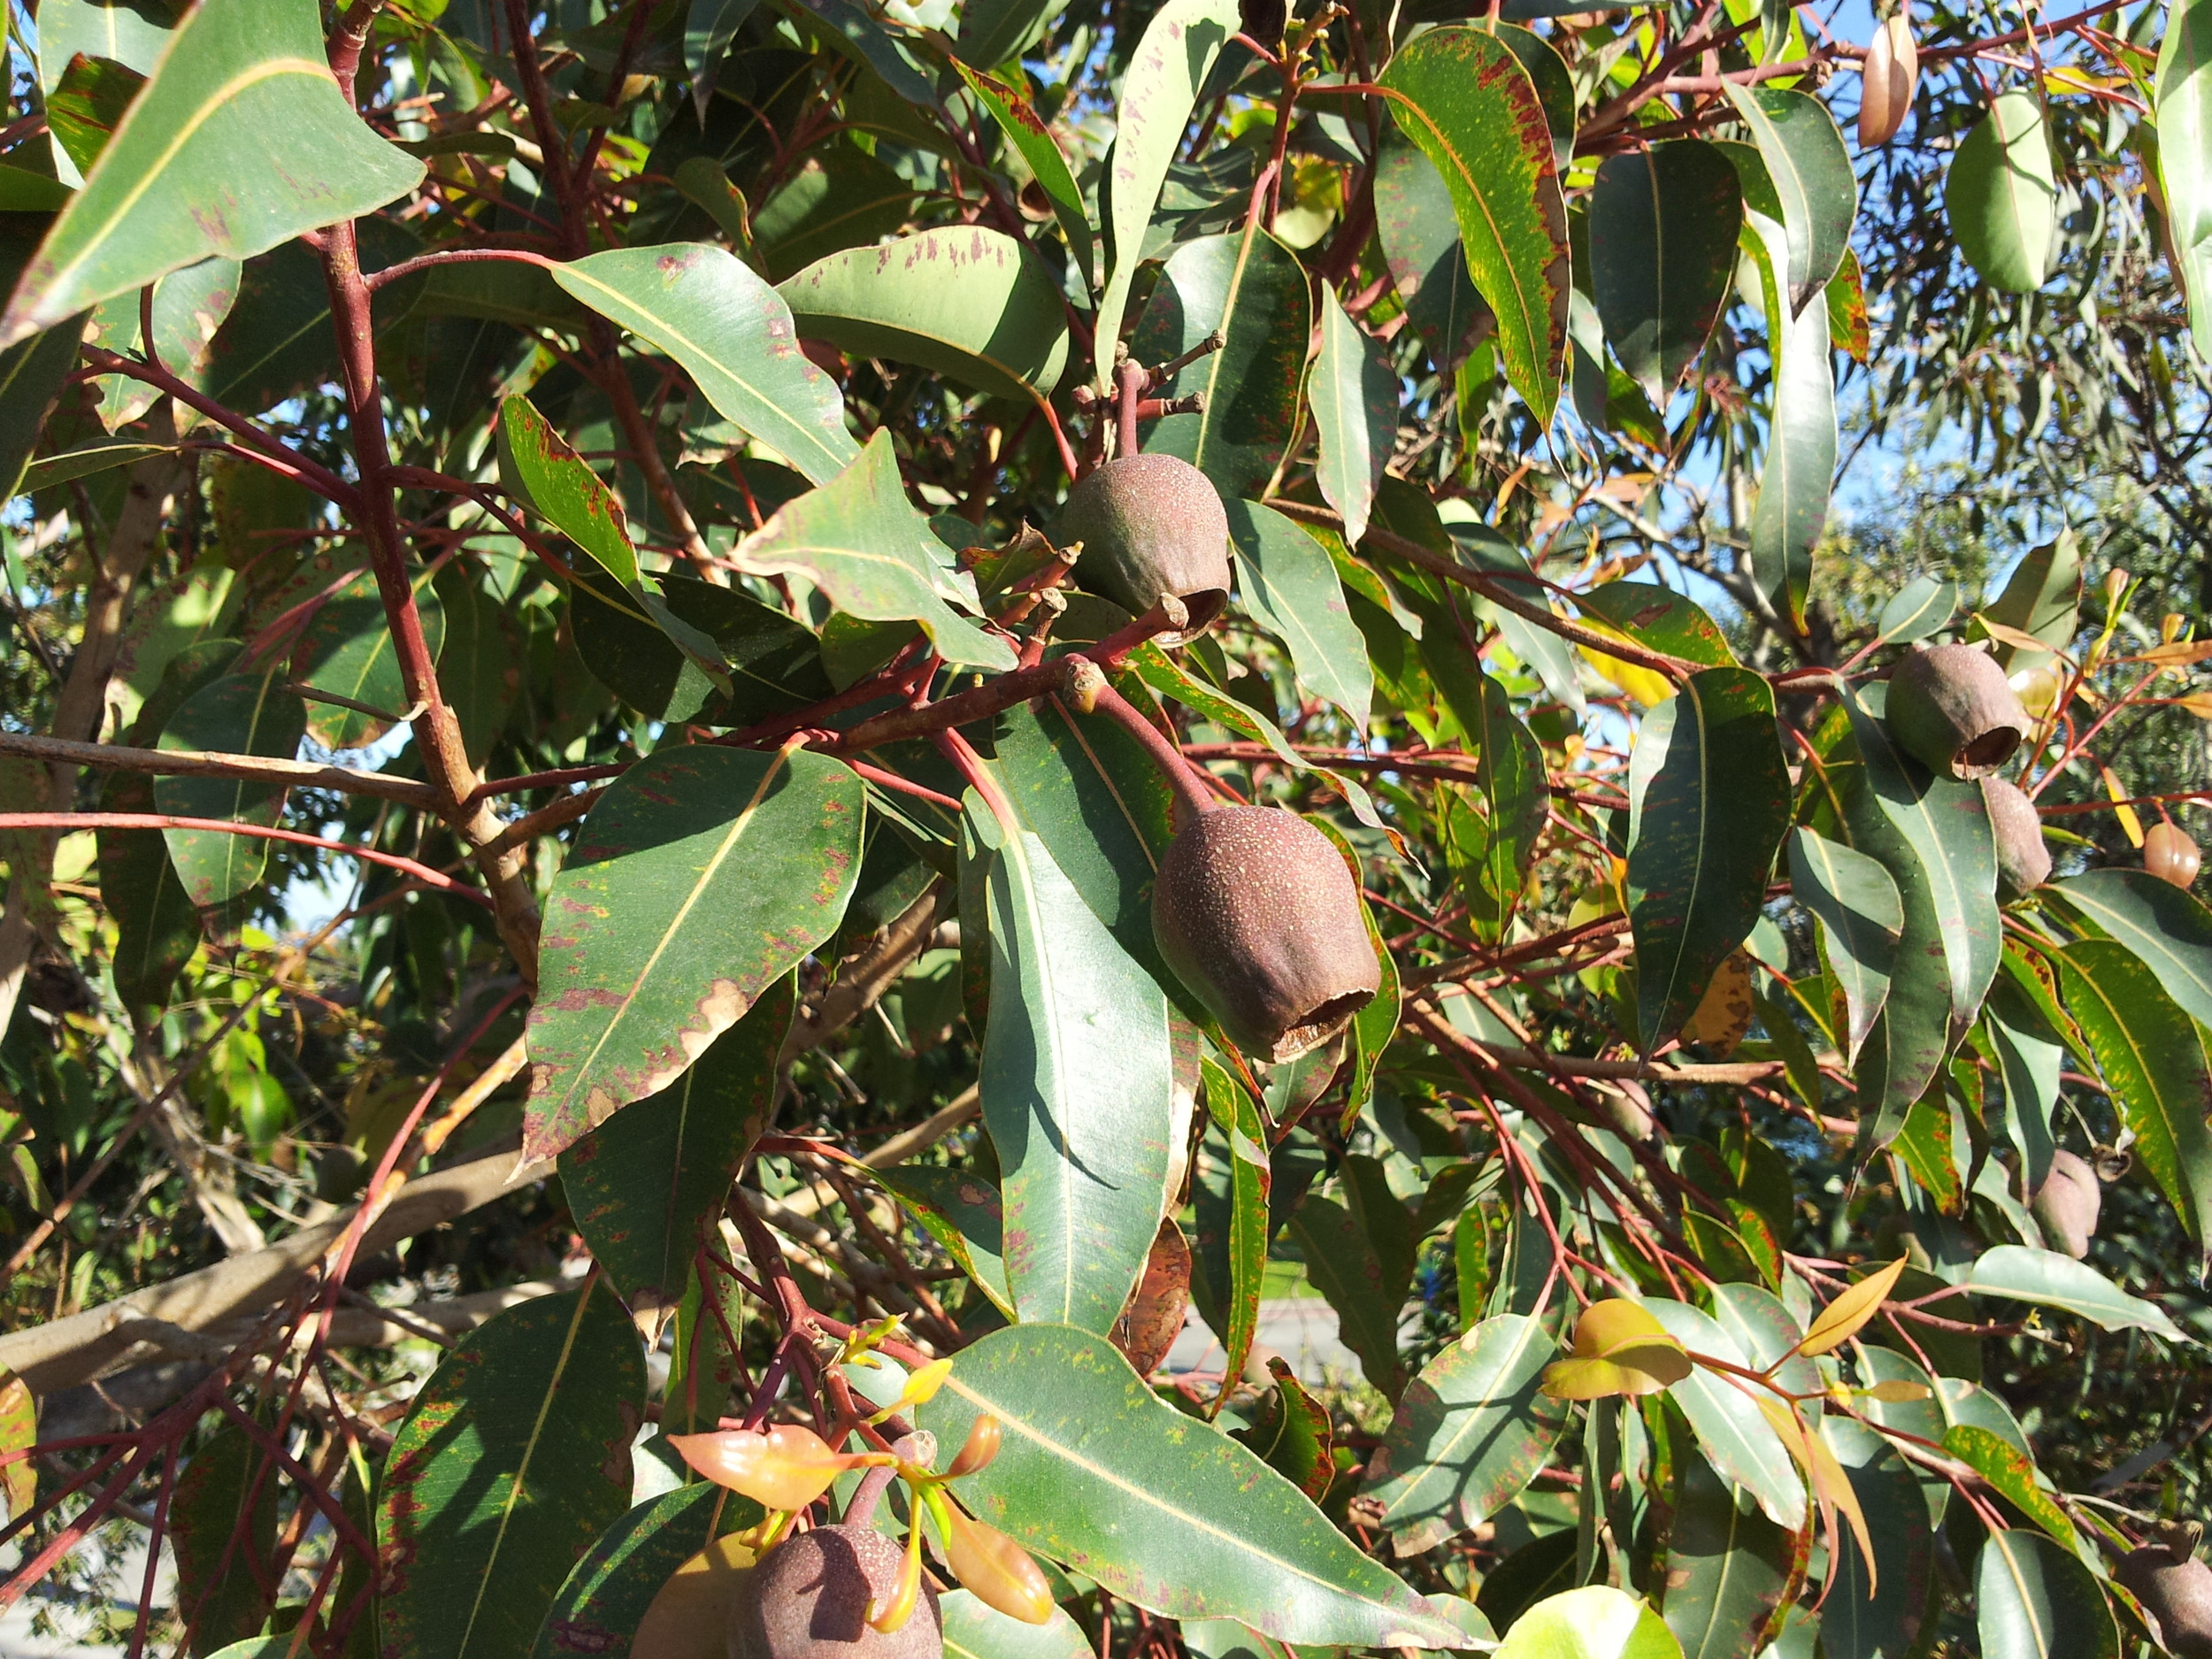 The iconic gumnuts of Australia's Eucalyptus trees.